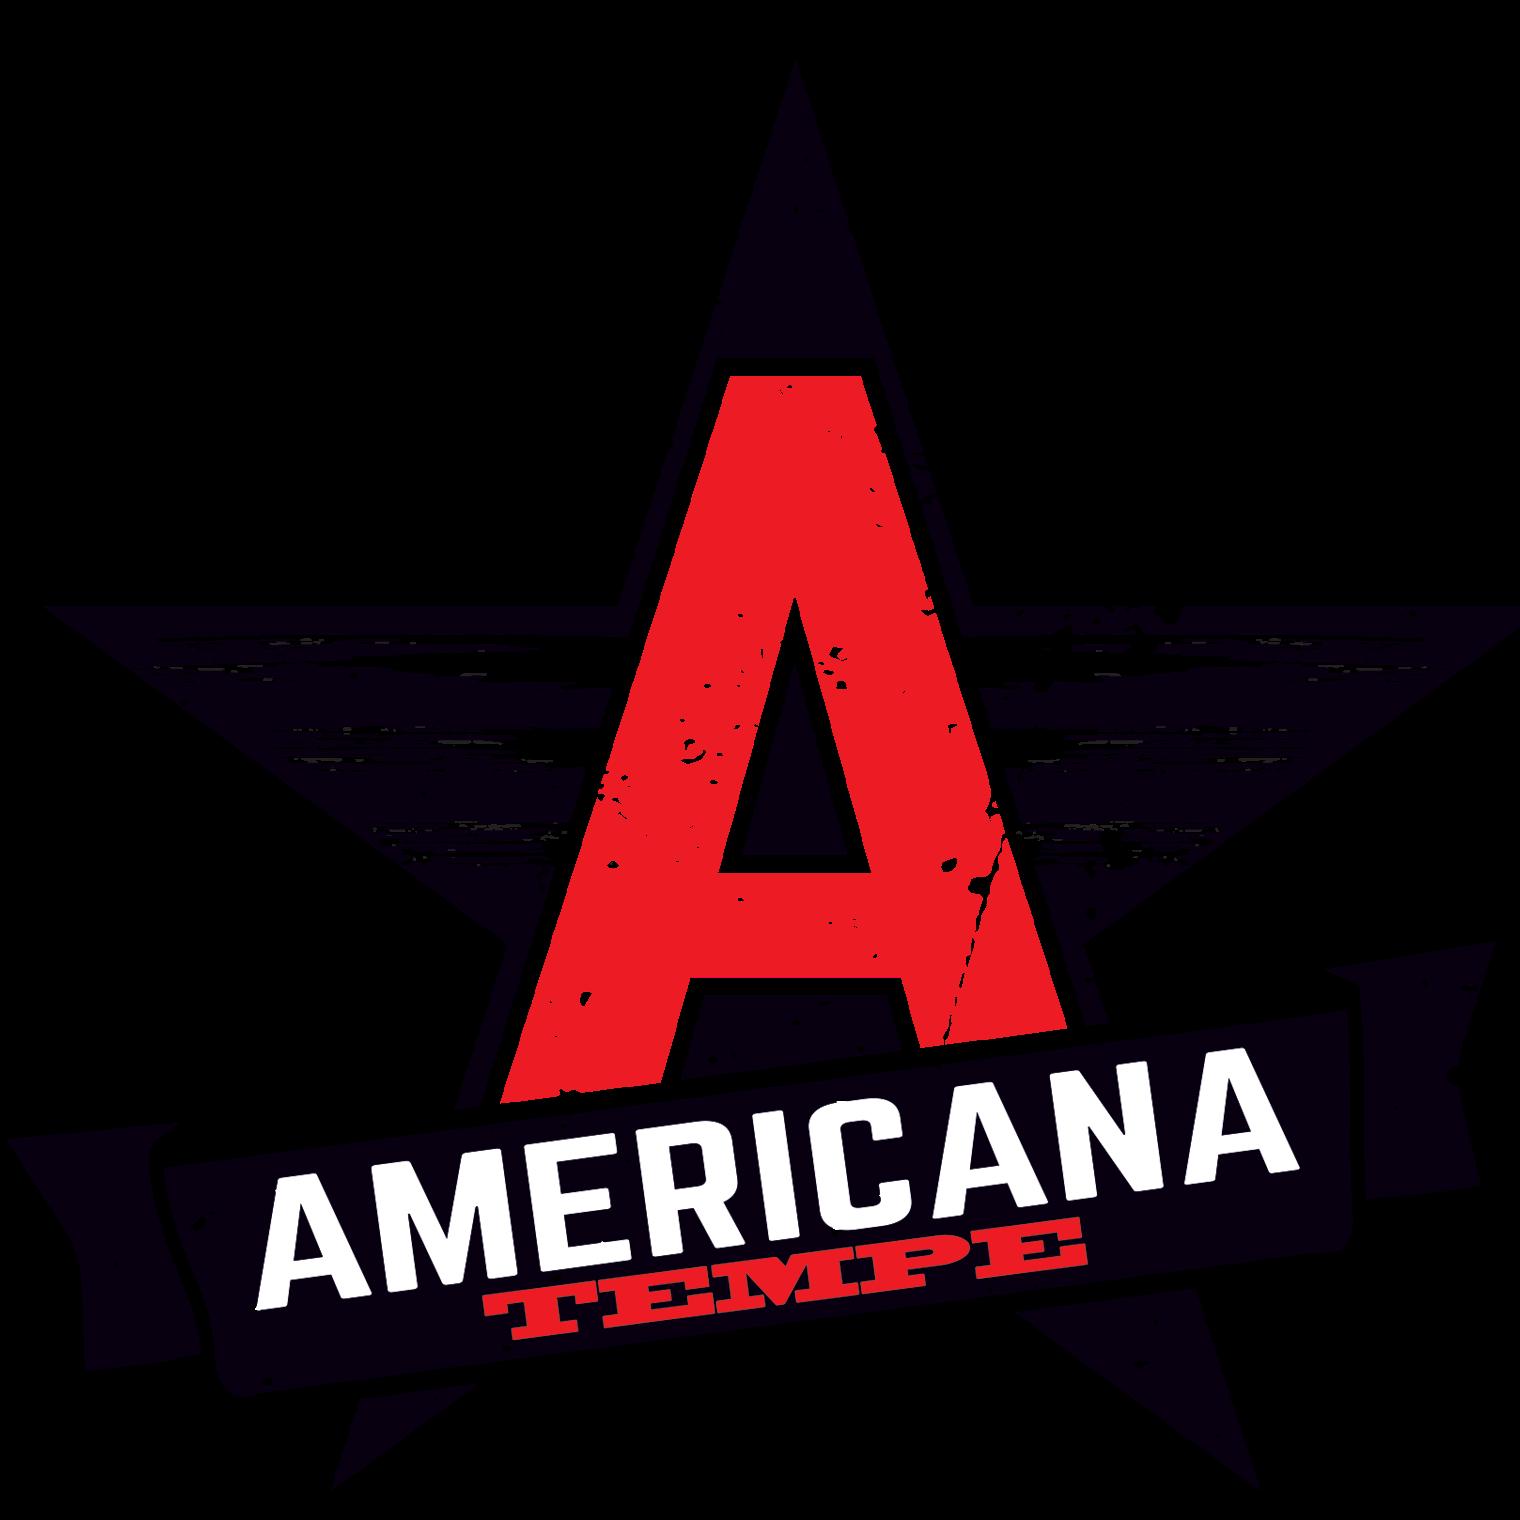 Americana Tempe image 20